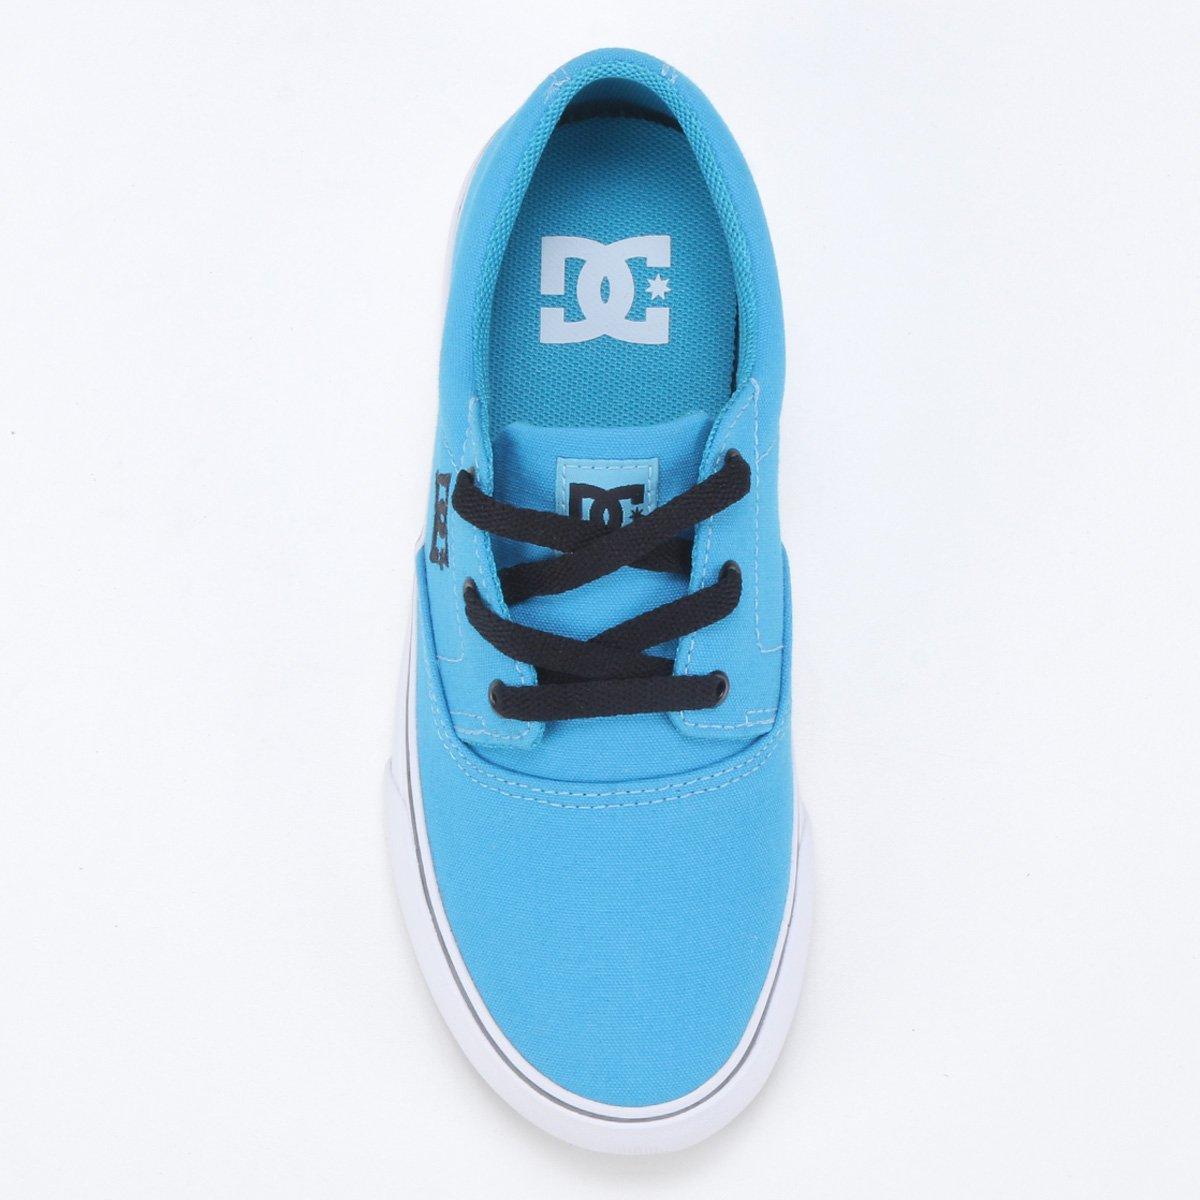 901292bb26 Tênis Infantil DC Shoes Flash 2 Tx La Masculino - Azul - Compre ...